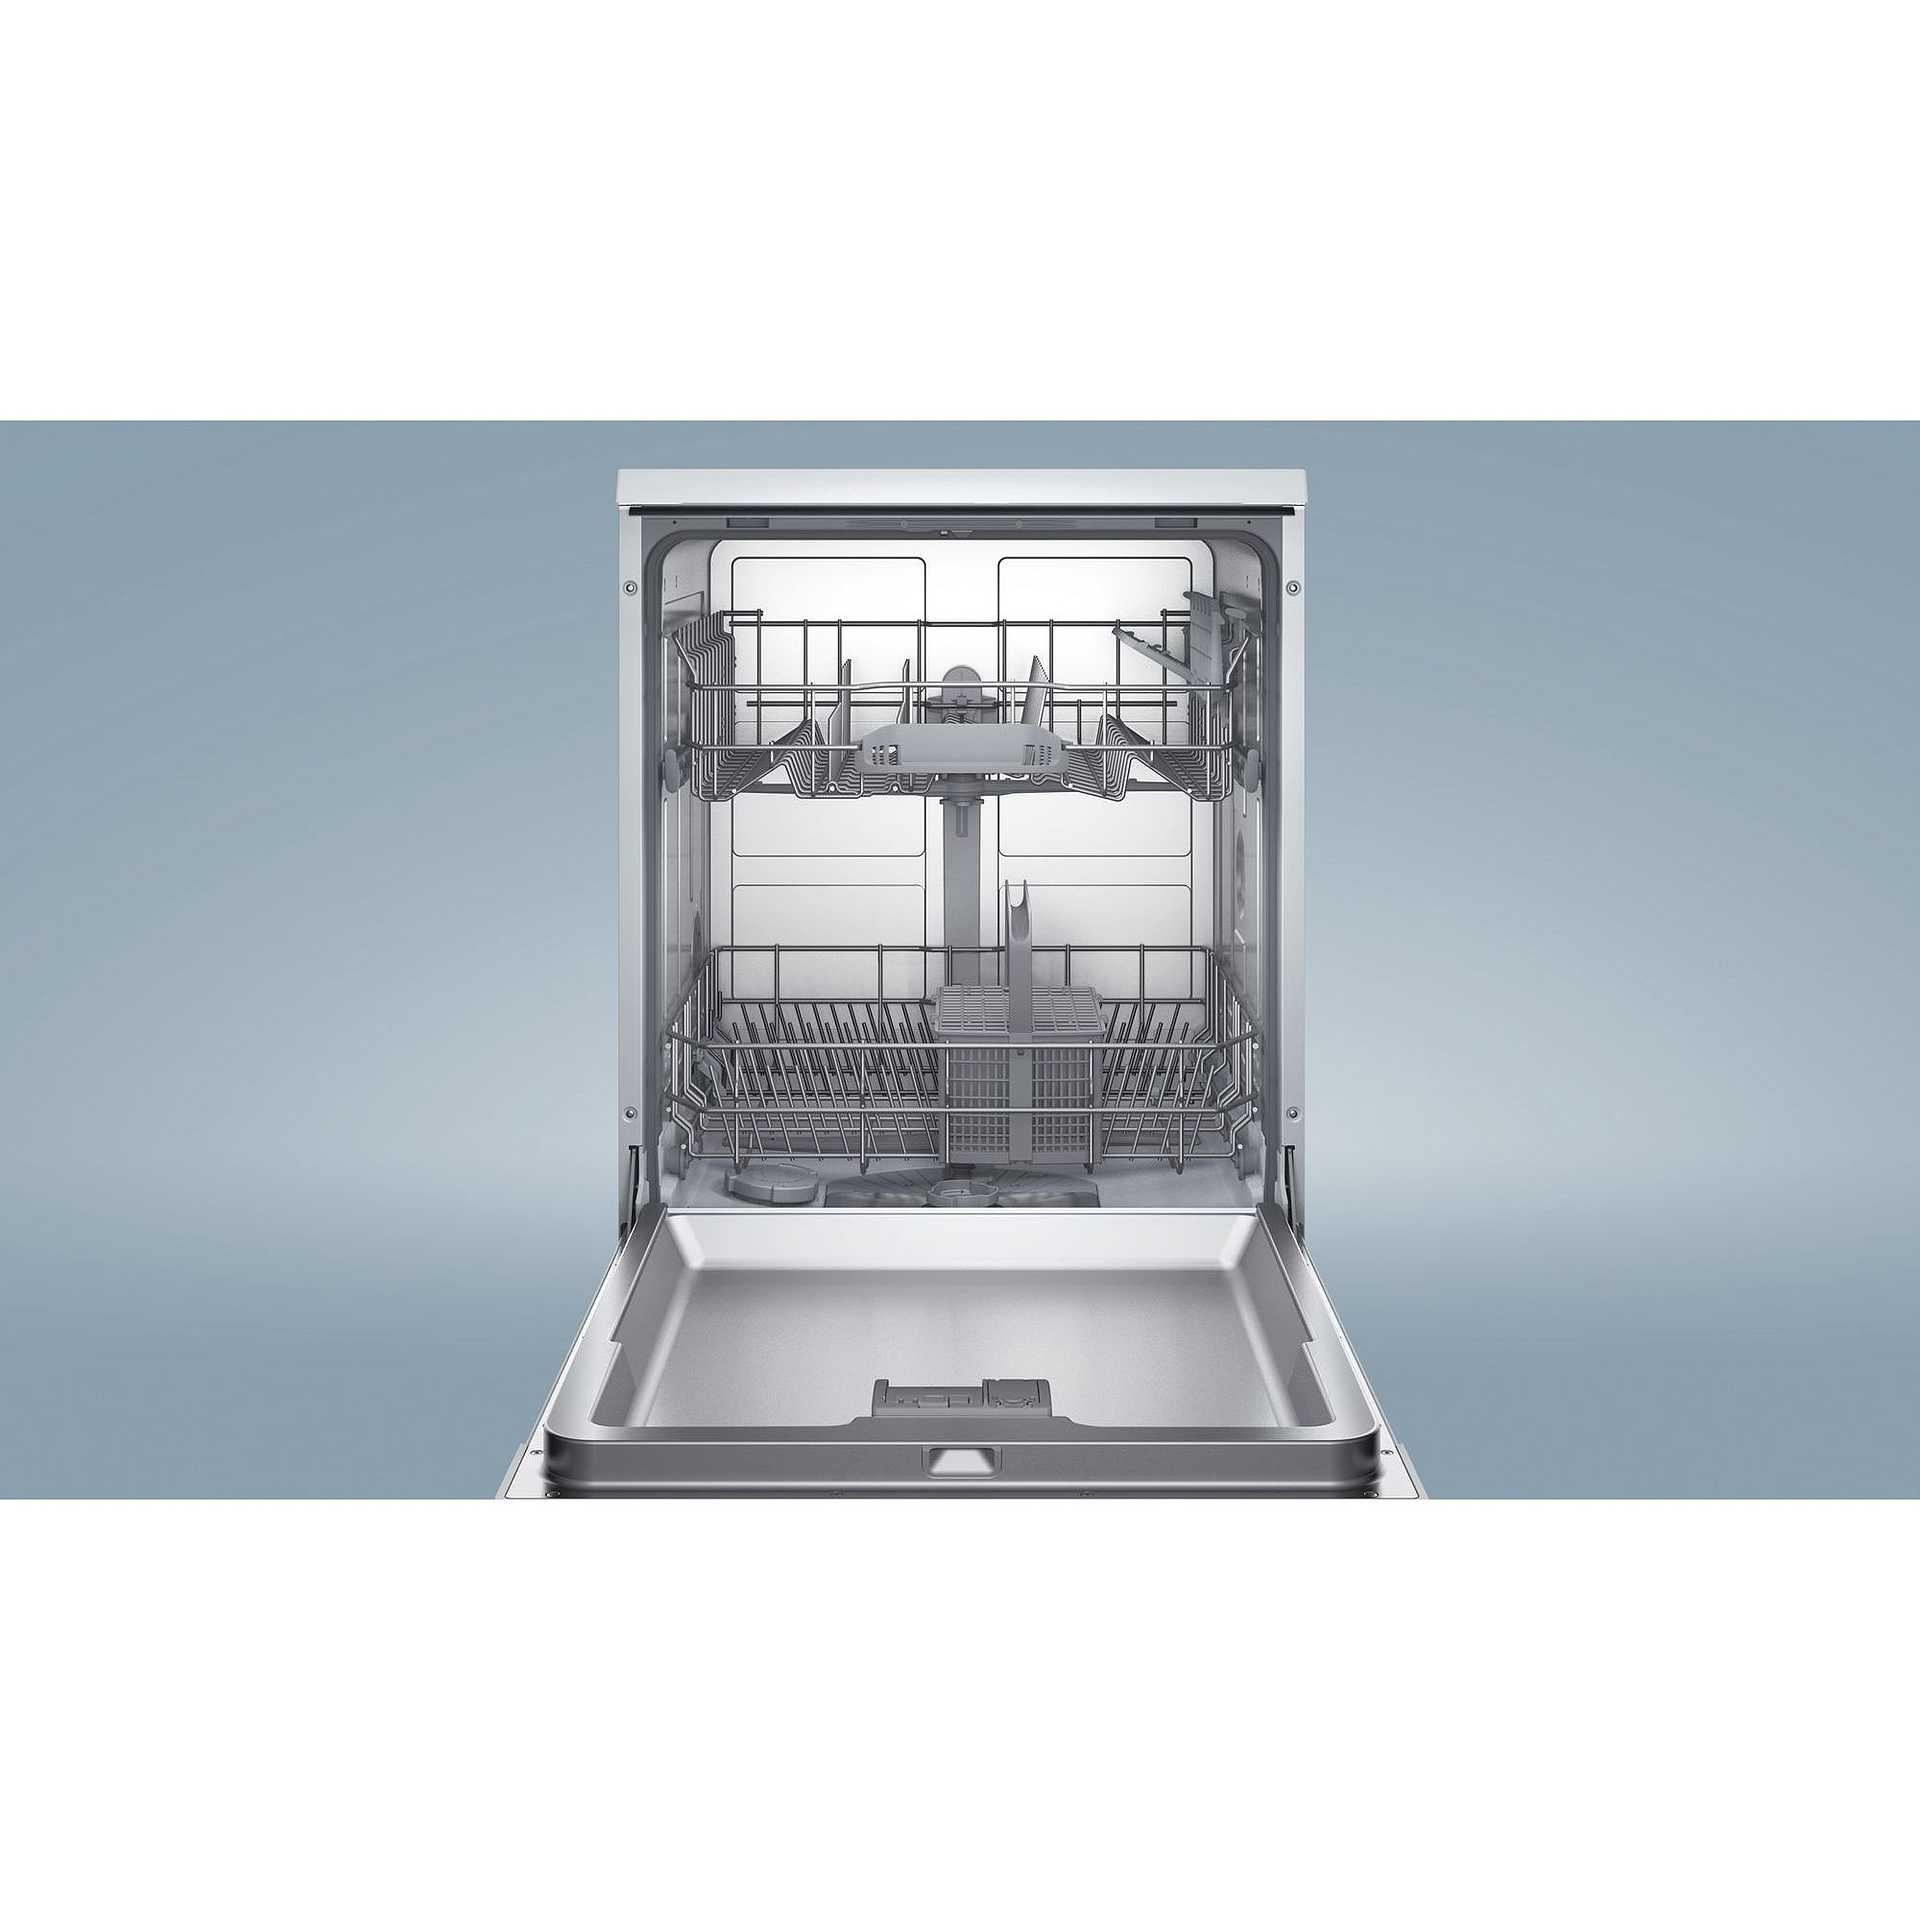 Siemens SN215W02AJ iQ100 lavastoviglie 12 coperti 5 ...